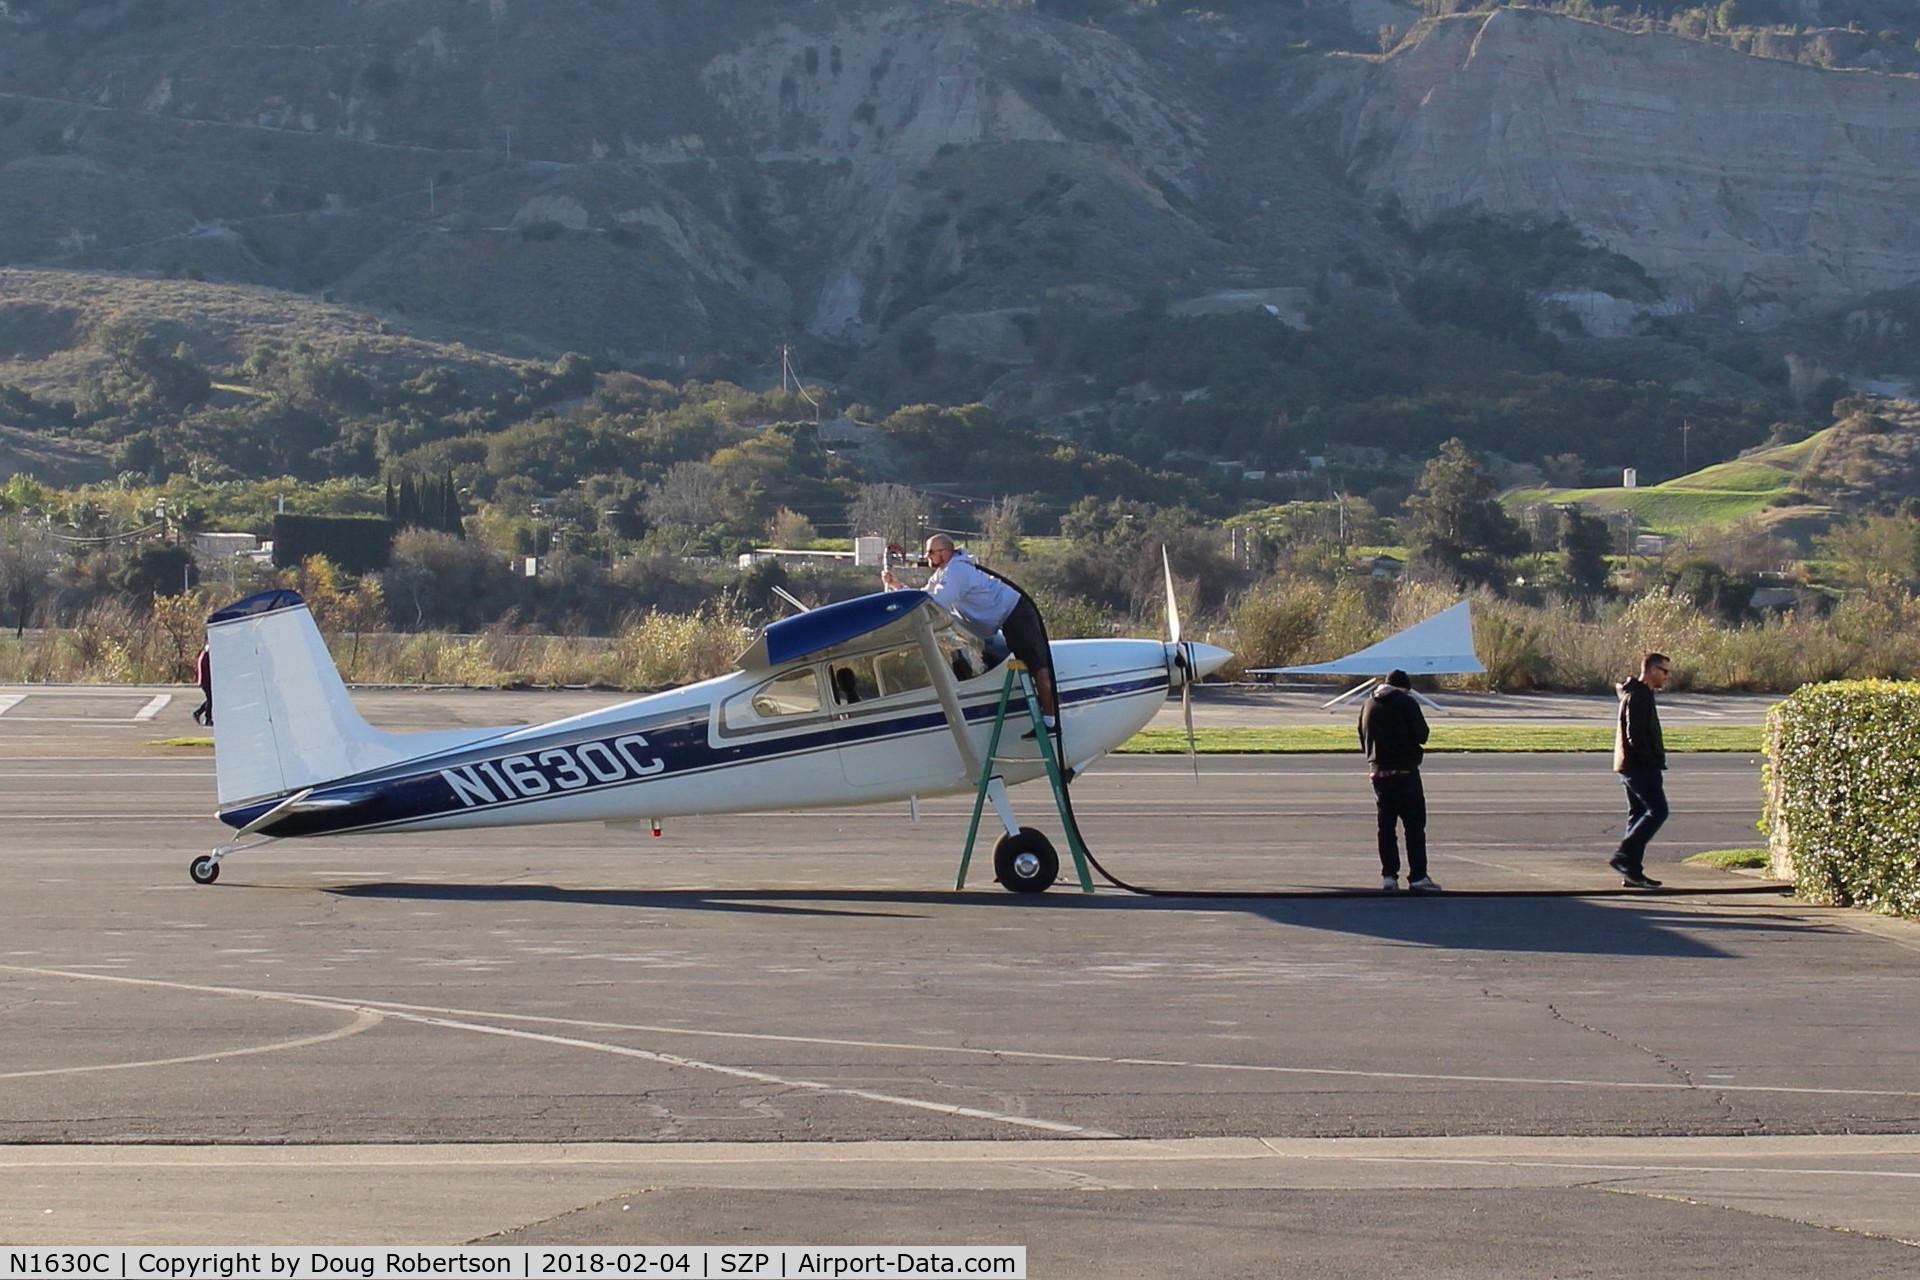 N1630C, 1953 Cessna 180 C/N 30330, 1953 Cessna 180, Continental O-470 230 Hp, at Fuel Dock refueling